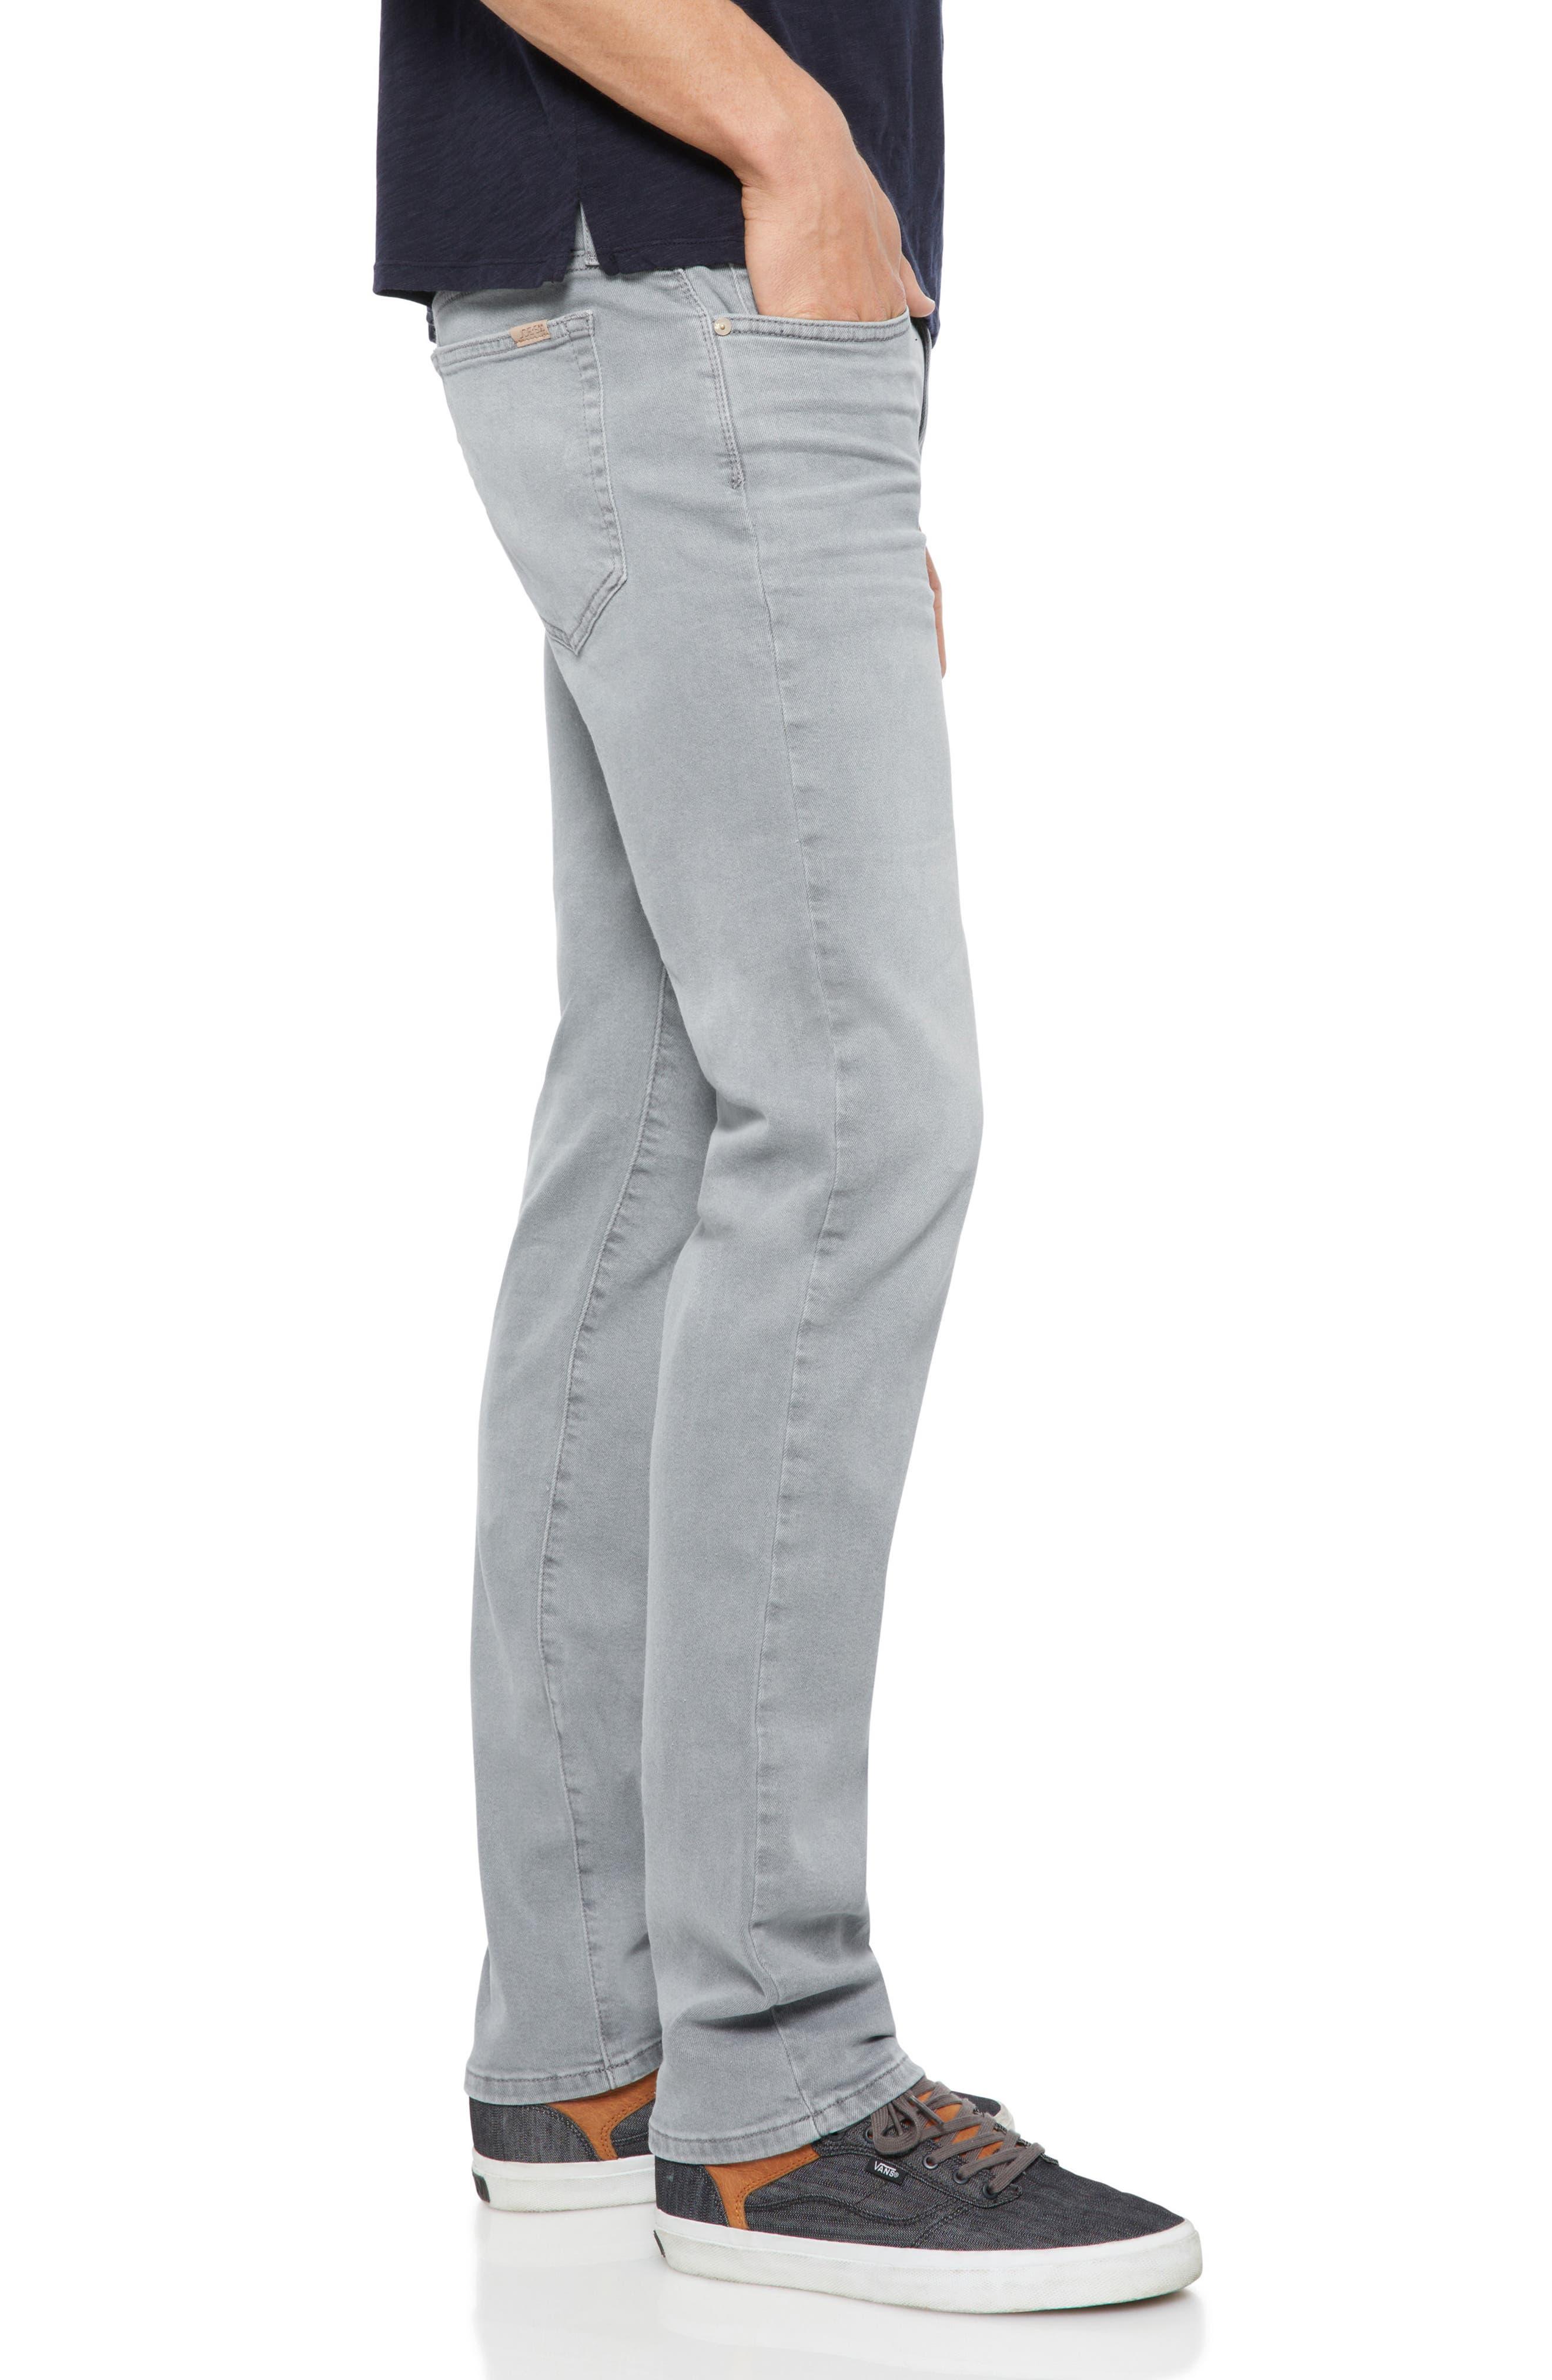 Brixton Slim Straight Leg Jeans,                             Alternate thumbnail 3, color,                             Feather